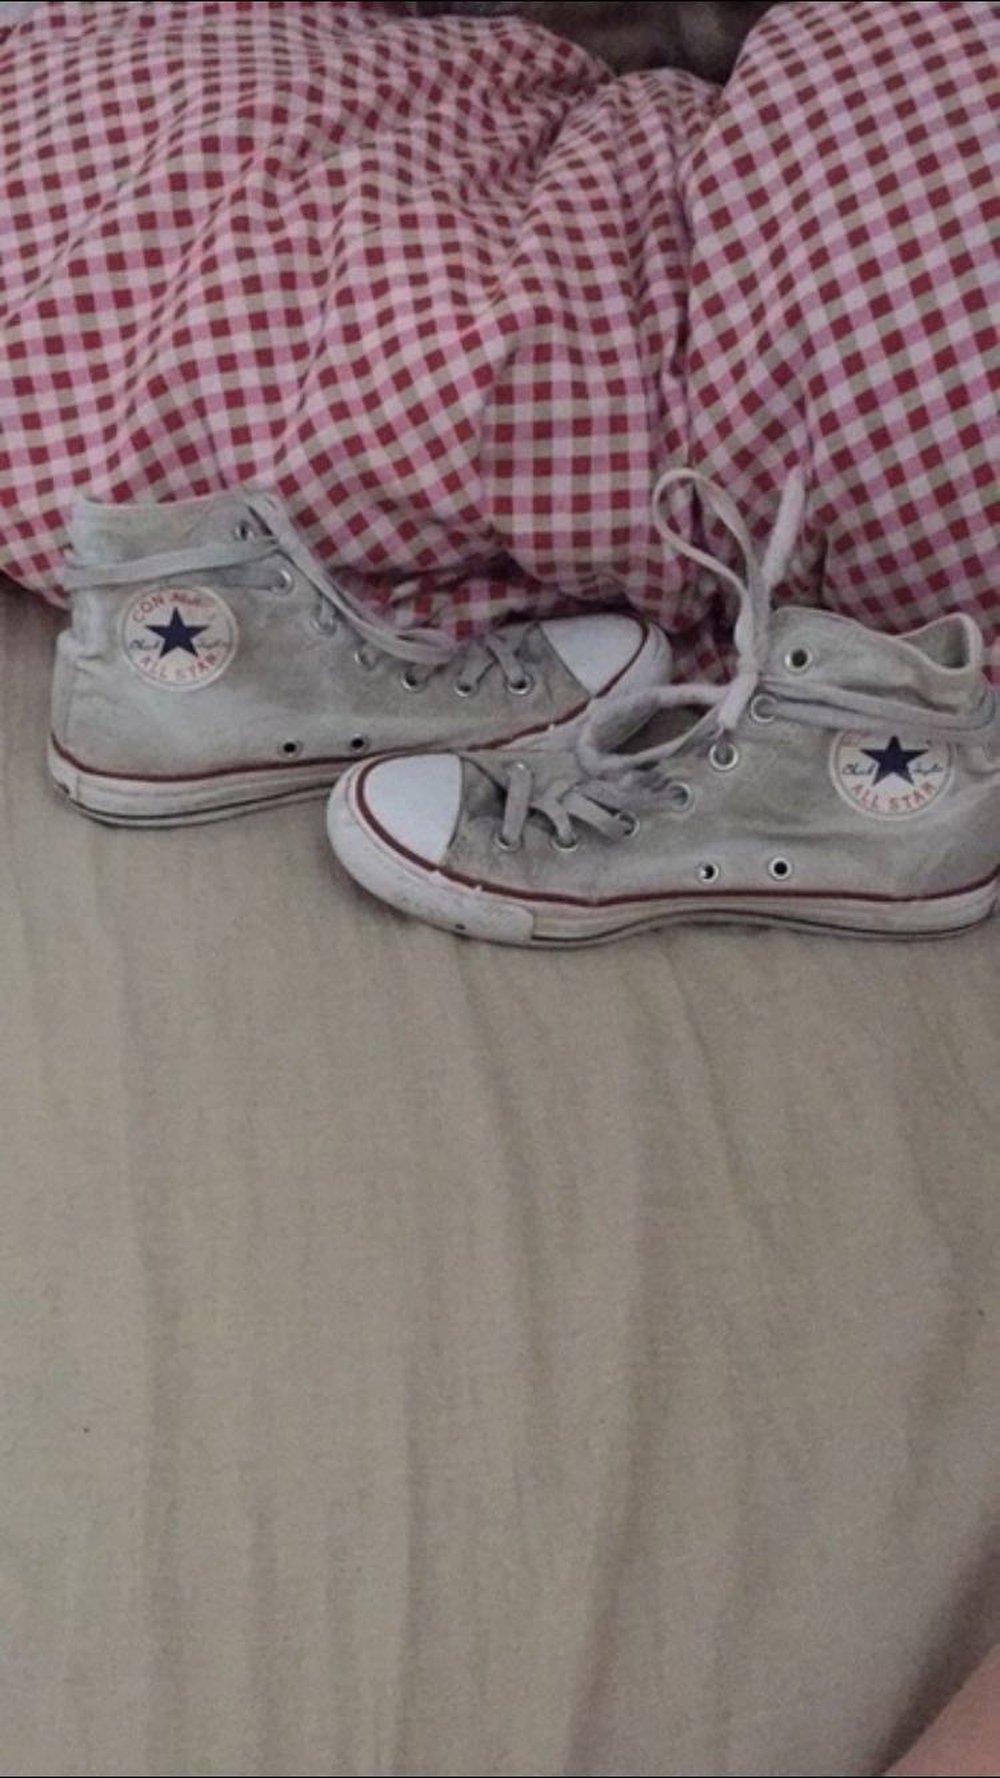 Tumblr Sneaker Cool Converse Chucks Weiß DYE2HW9I